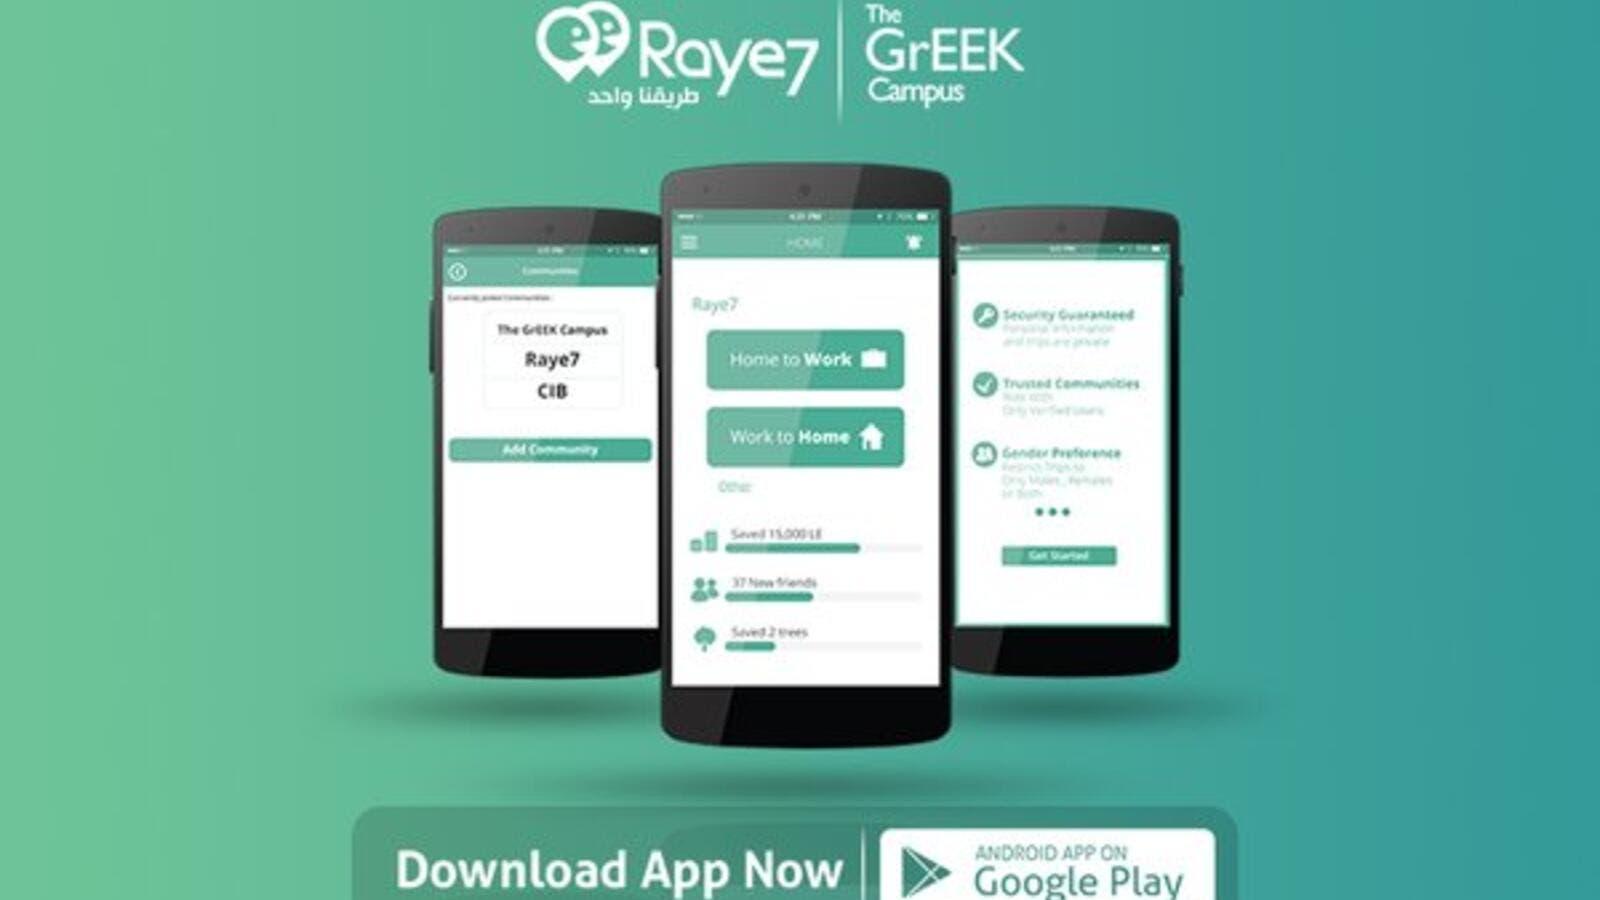 Egypt S Carpooling App Raye7 Wins Big At Gsma Mobile World Congress